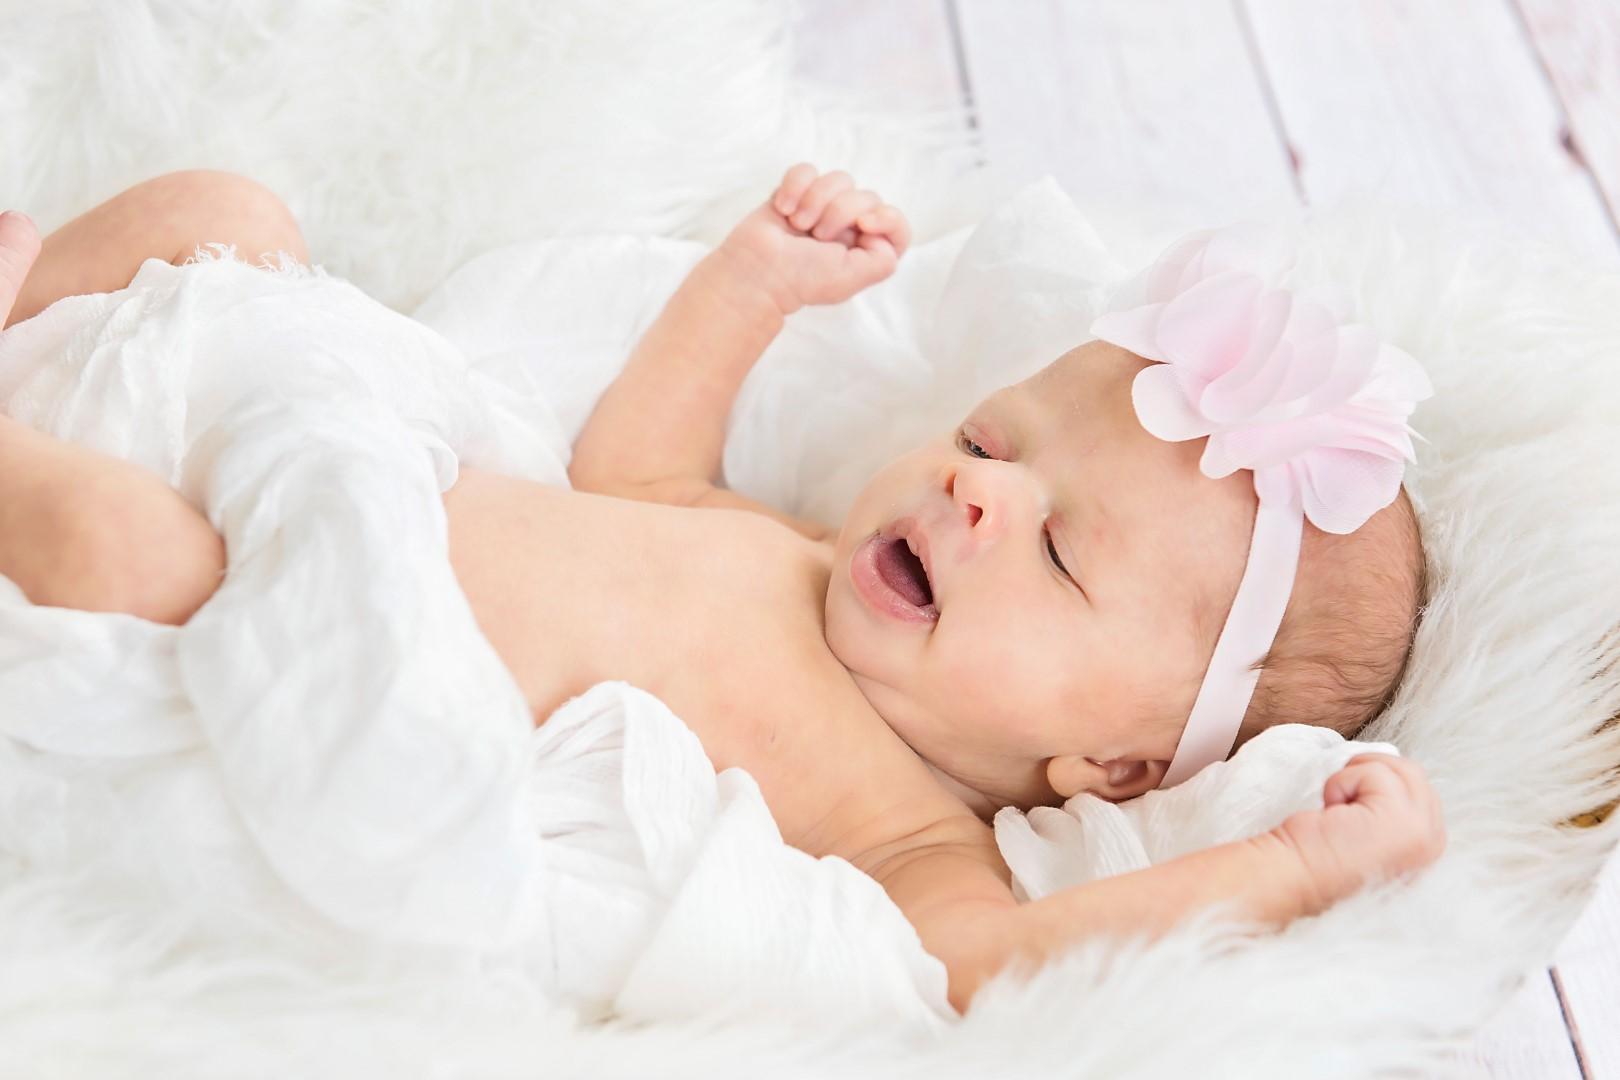 Baby_Parker_Newborn_08 (Large).jpg